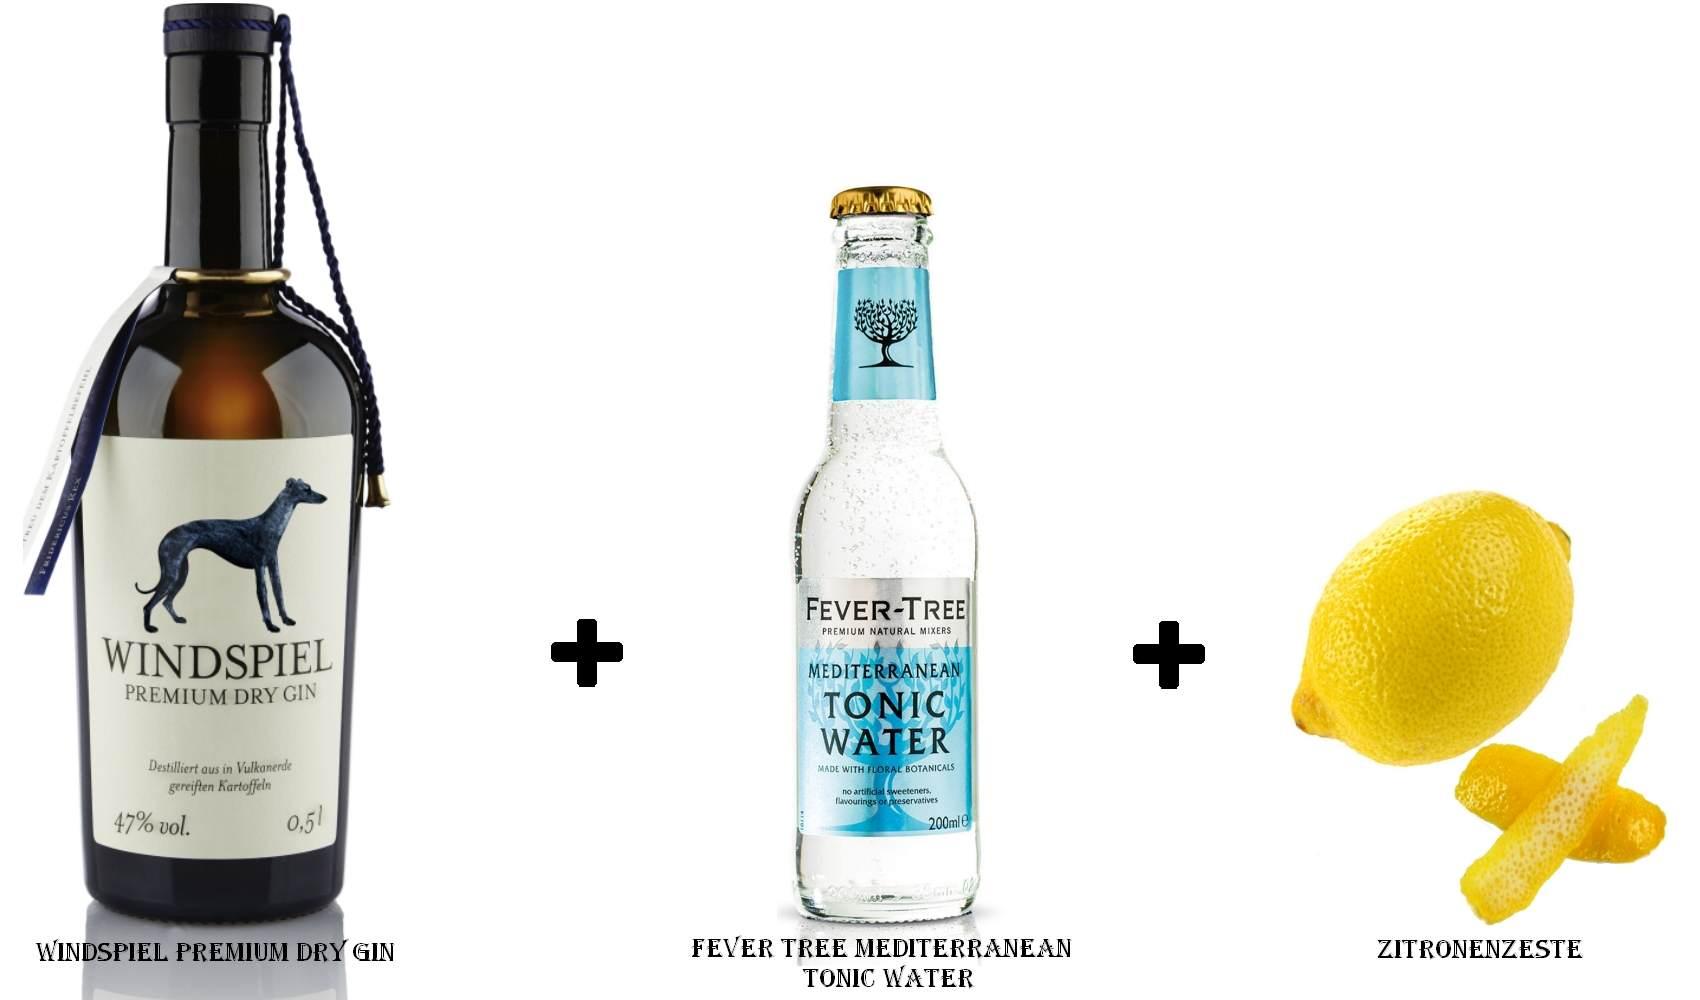 Windspiel Premium Dry Gin + Fever Tree Mediterranean Tonic Water + Zitronenzeste